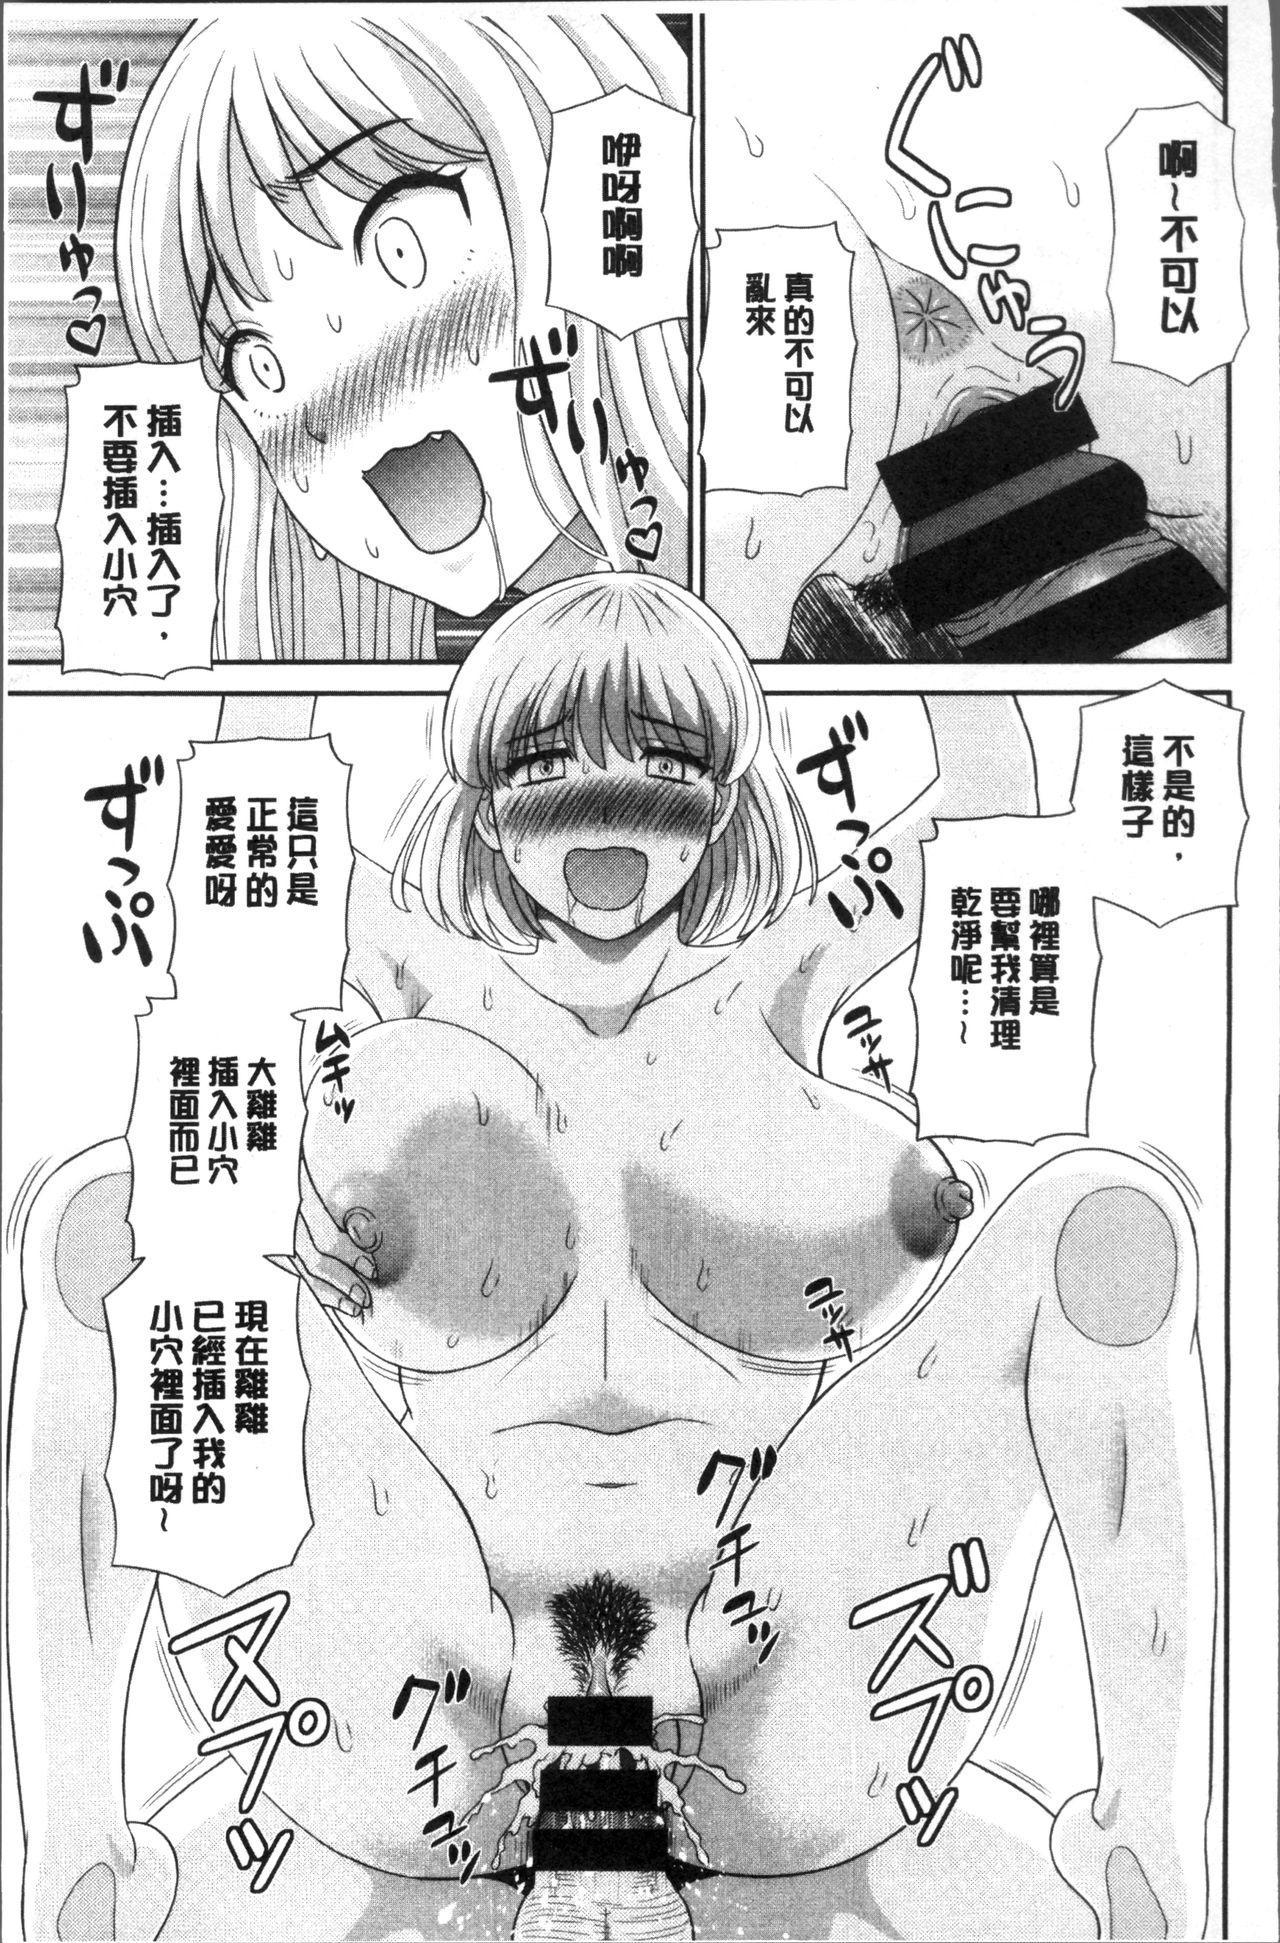 [Kawamori Misaki] Innyuu Shufu no Futei Ganbou - Oku-san to Kanojo to 2 | 淫乳主婦的不貞願望 和人妻也和女友❤2 [Chinese] 54